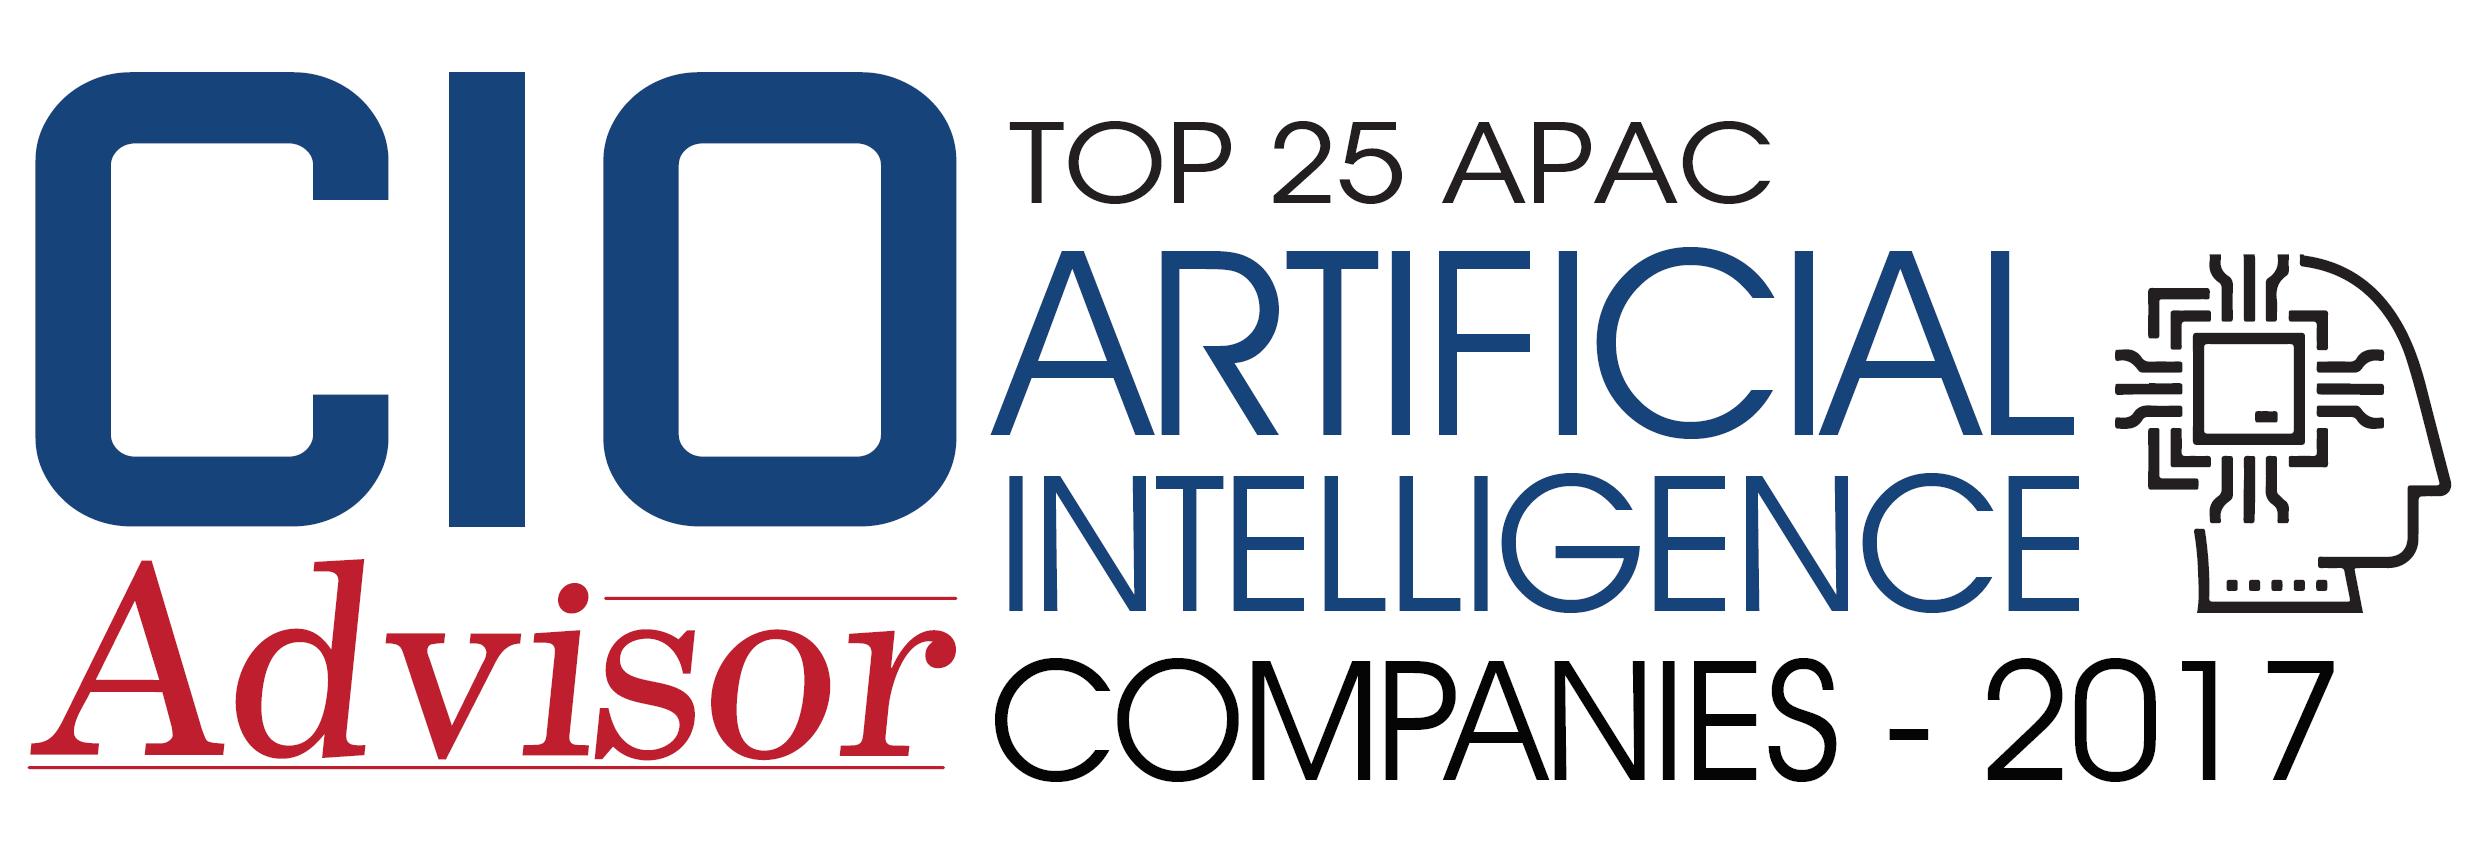 CiGen-robotic-process-automation-ranked-top-25-apac-artificial-intelligence-companies